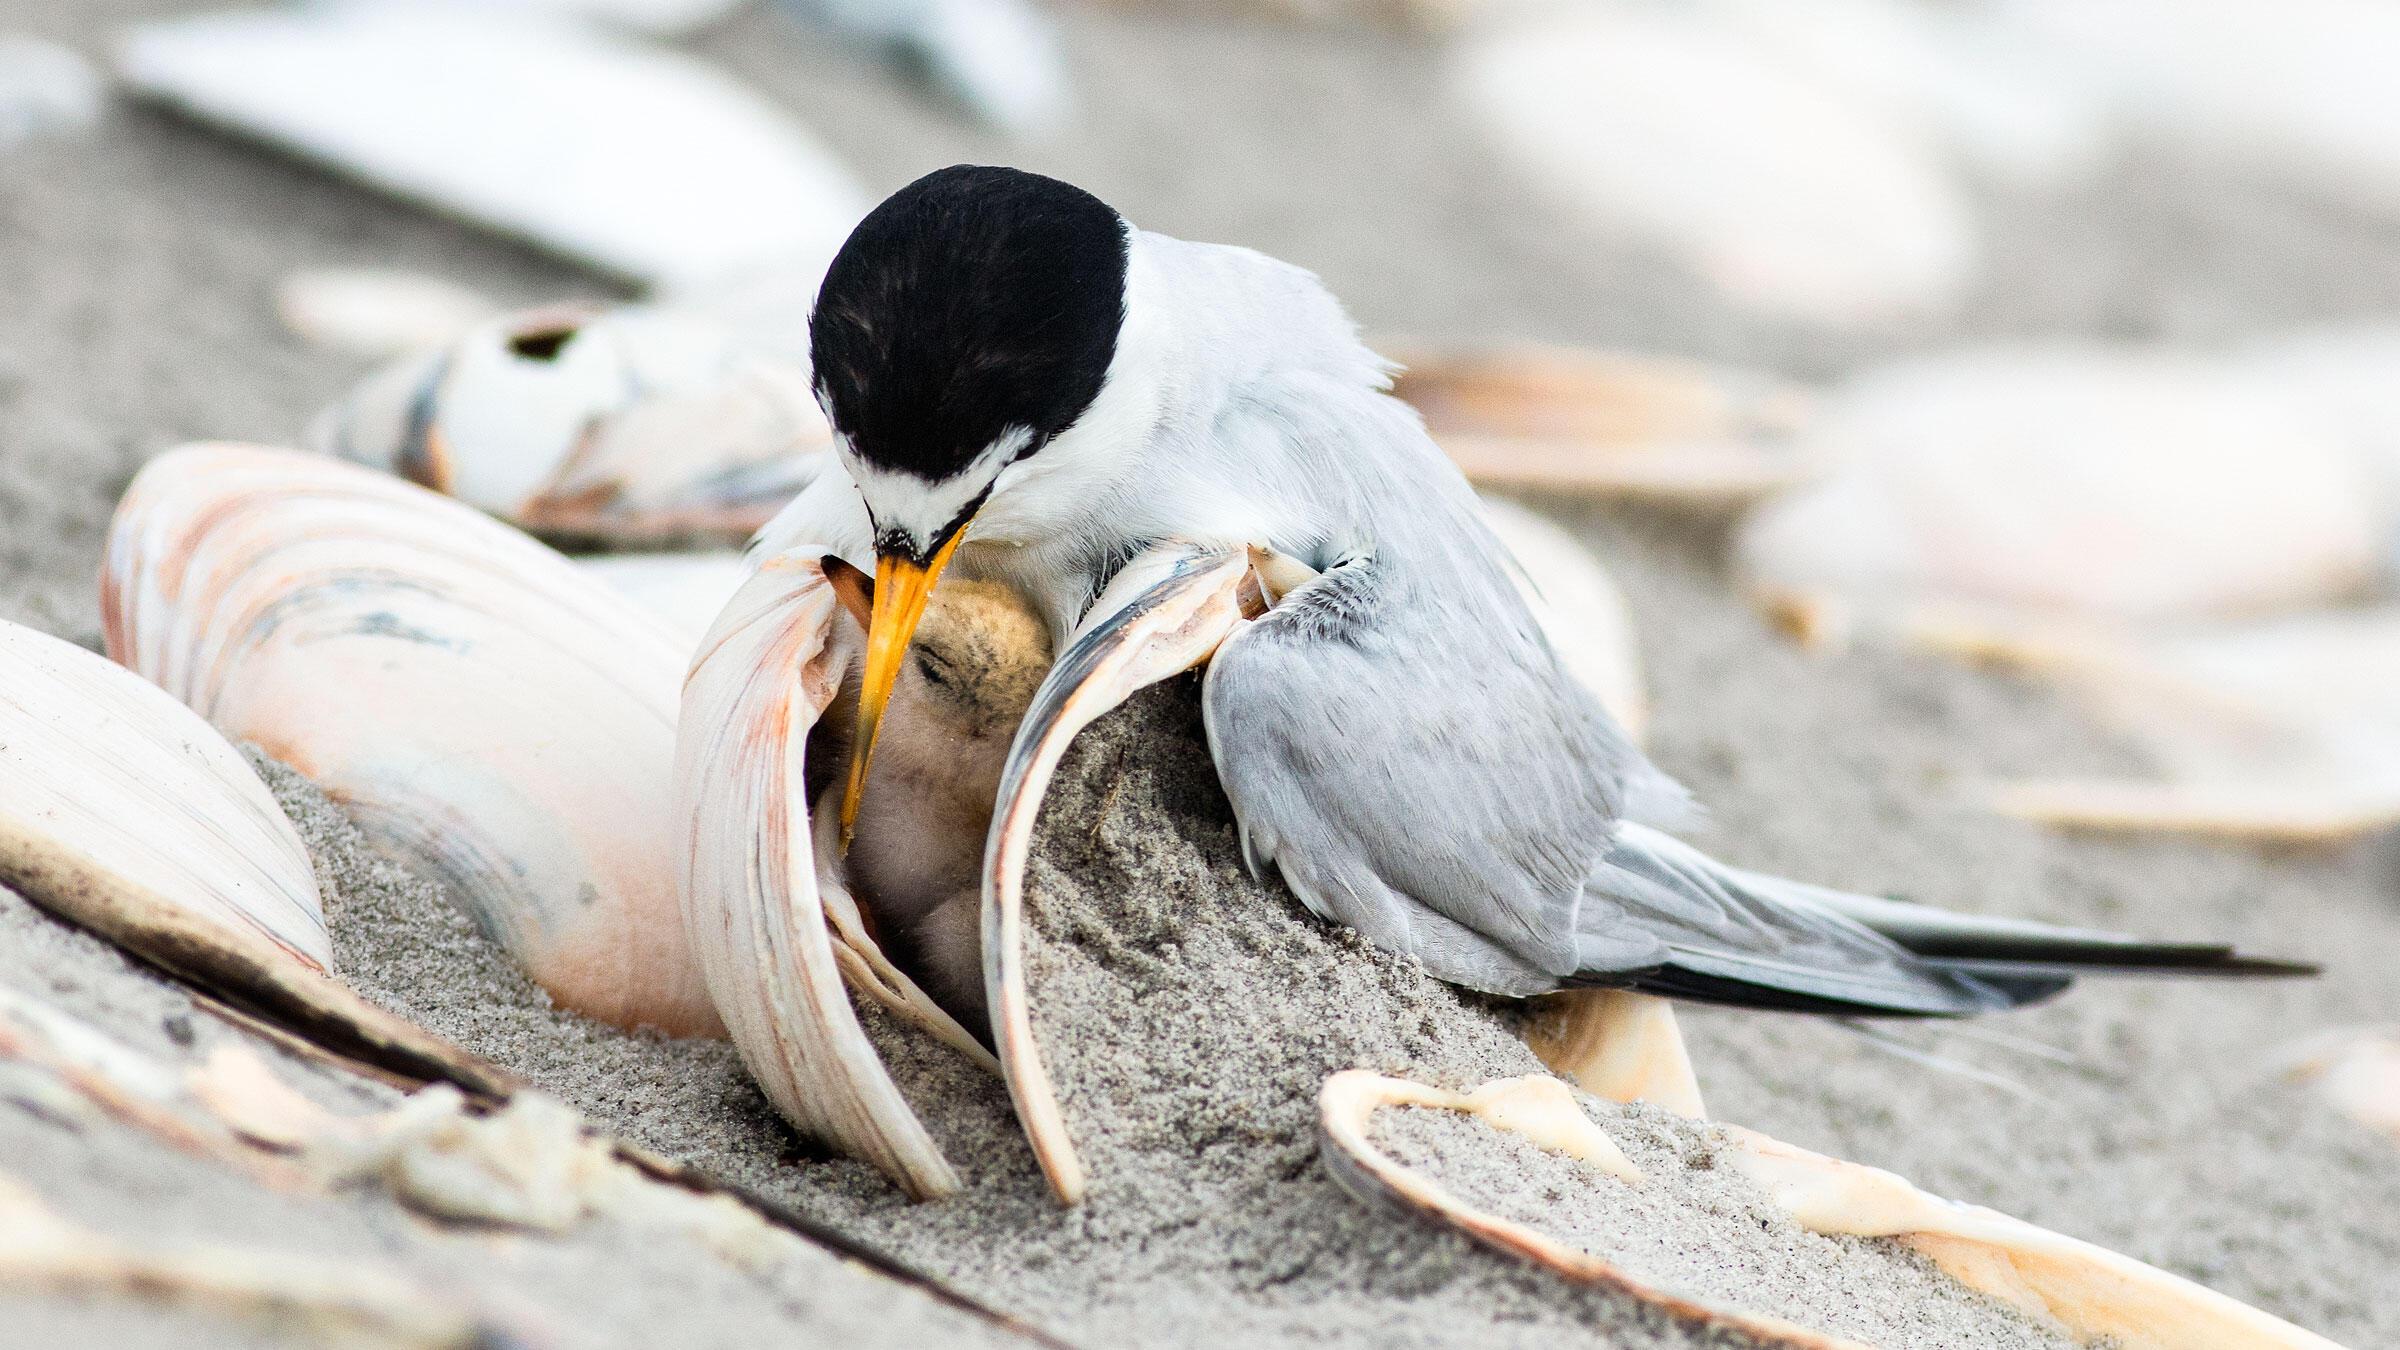 Least Tern with chick. Jim Verhagen/Audubon Photography Awards